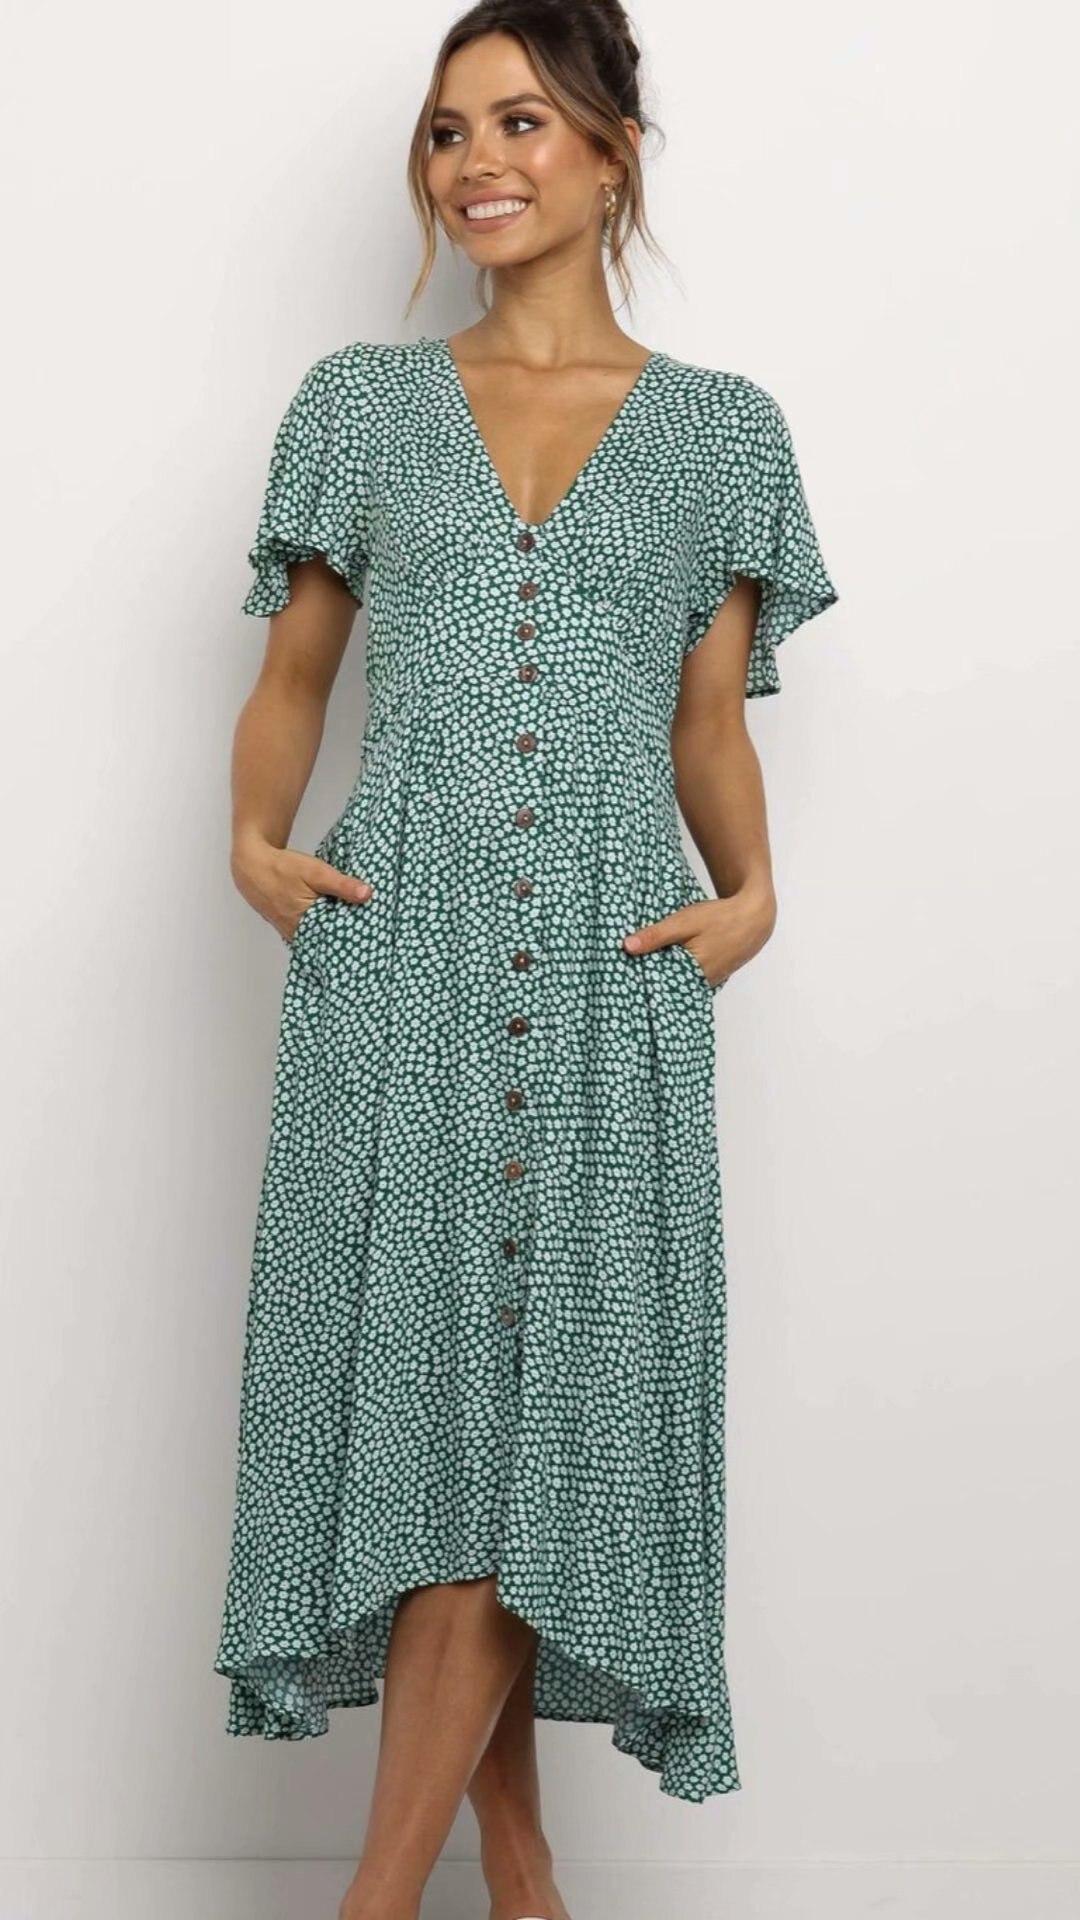 2020 Spring Summer New Jacquard Green Color Floral Print Dress zaraing vadiming sheining zafuler Sukienka Boho women dress S597